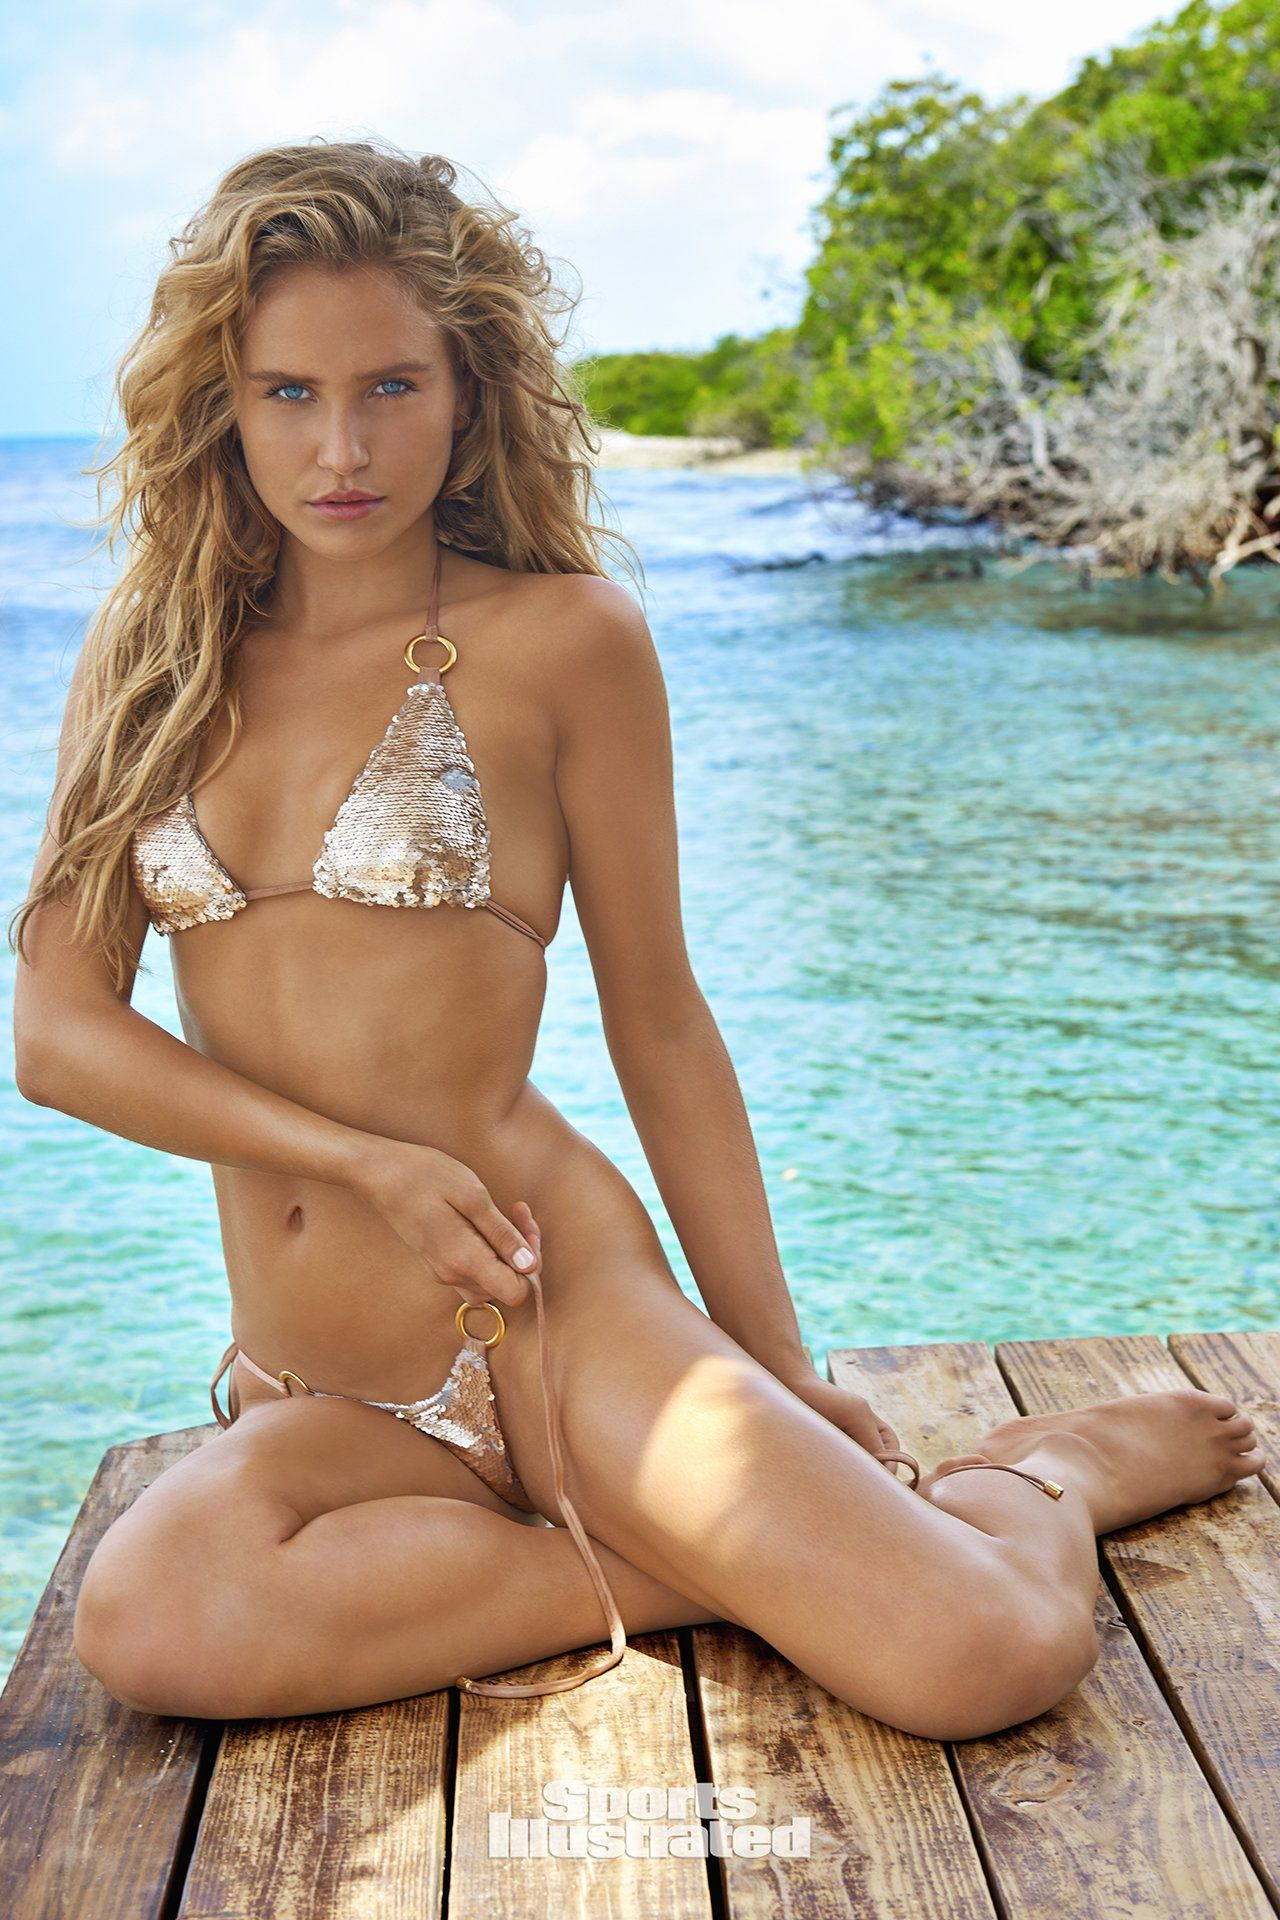 Heather Hanson Nude sailor brinkley cook sexy – #thefappening